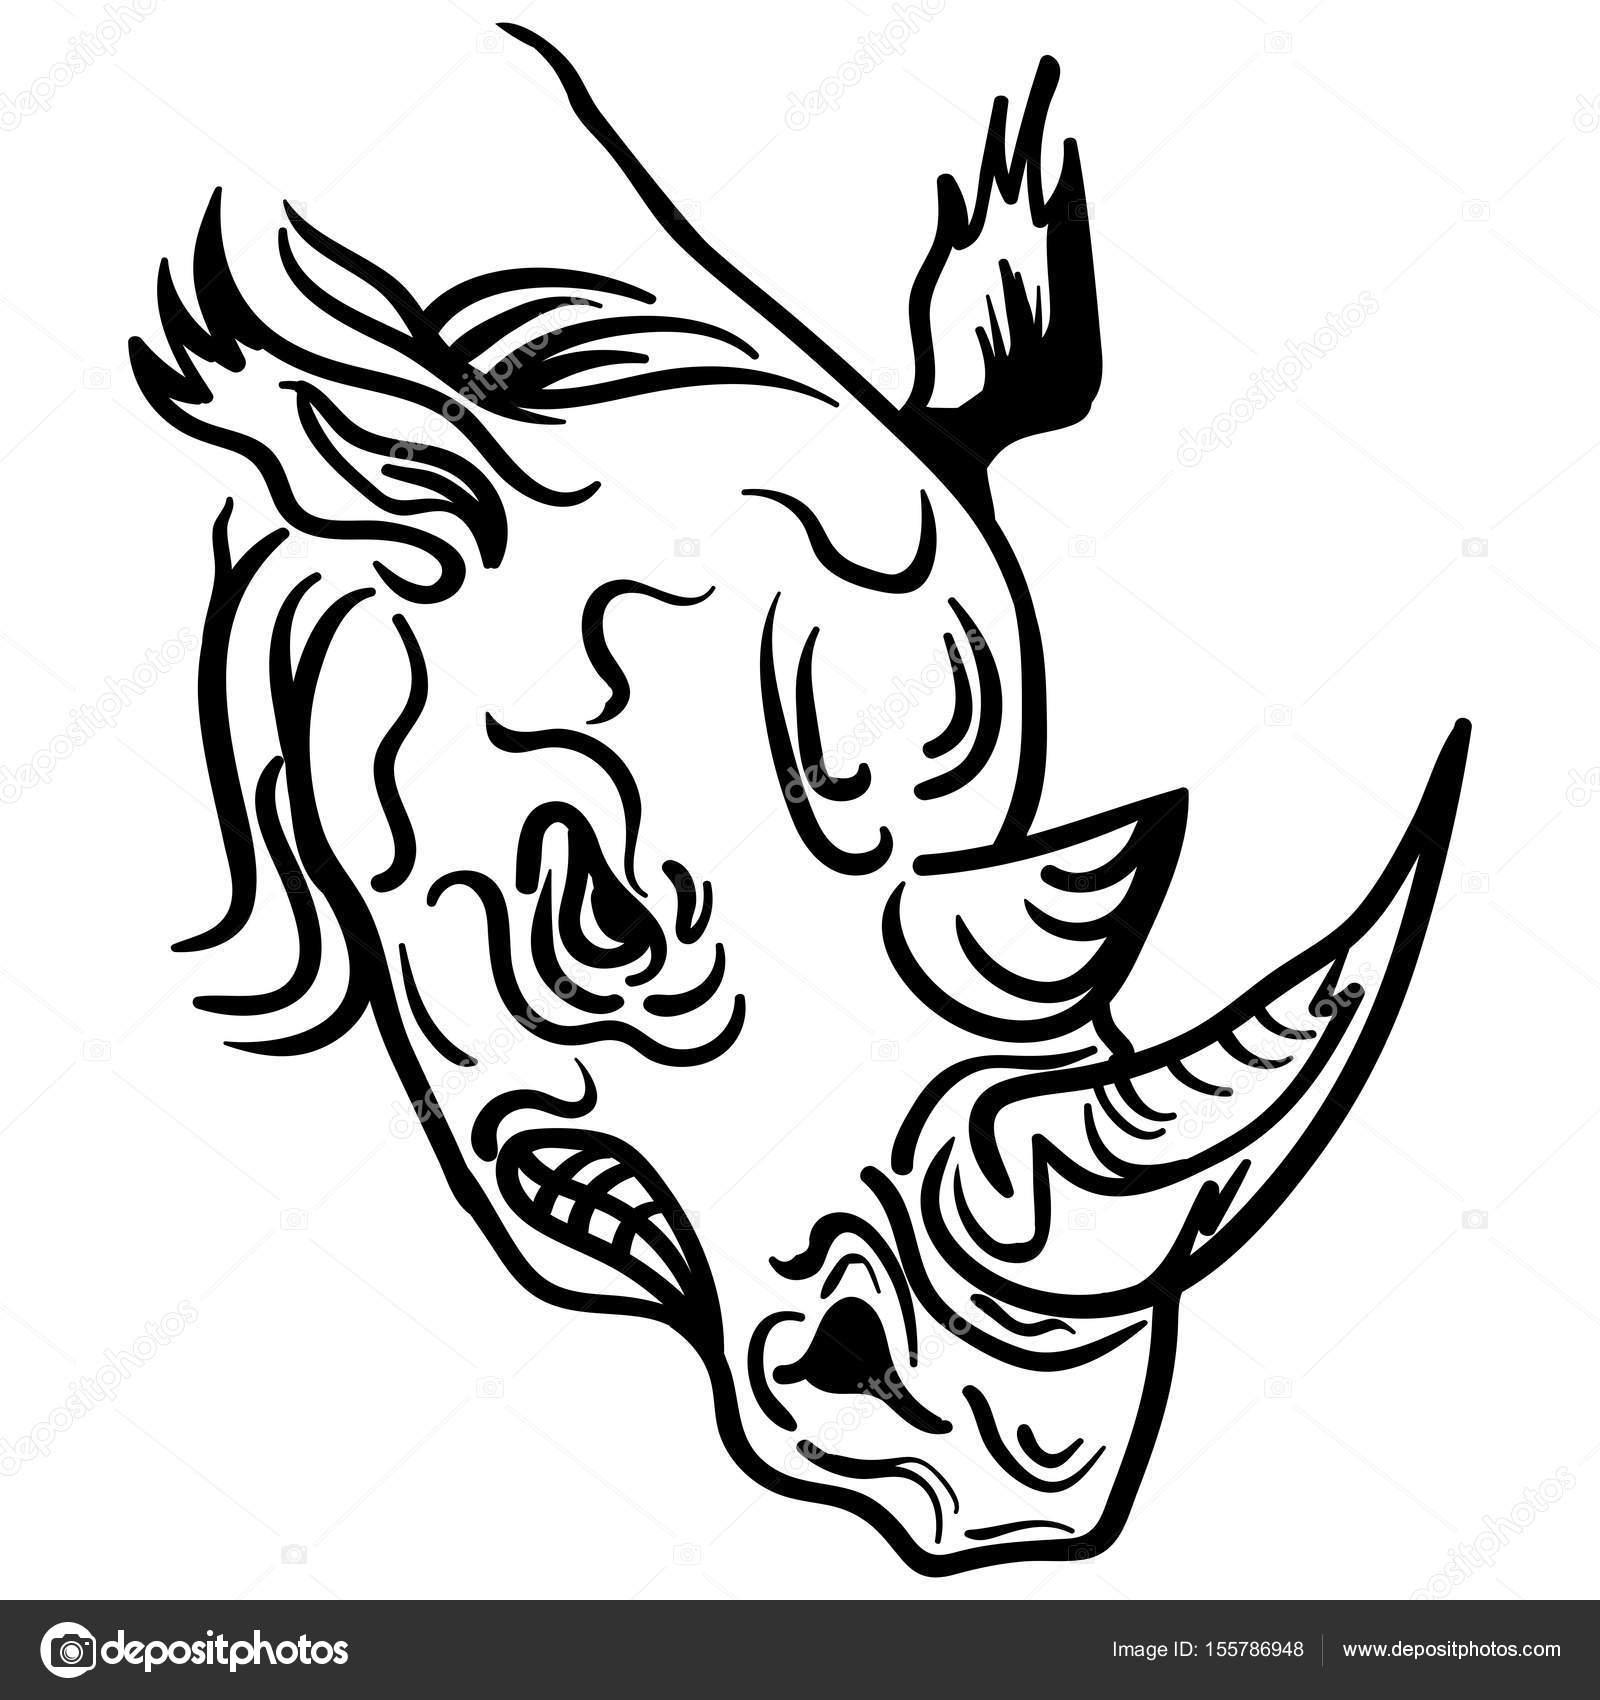 Rhino face paint | Linear paint draw rhino head vector